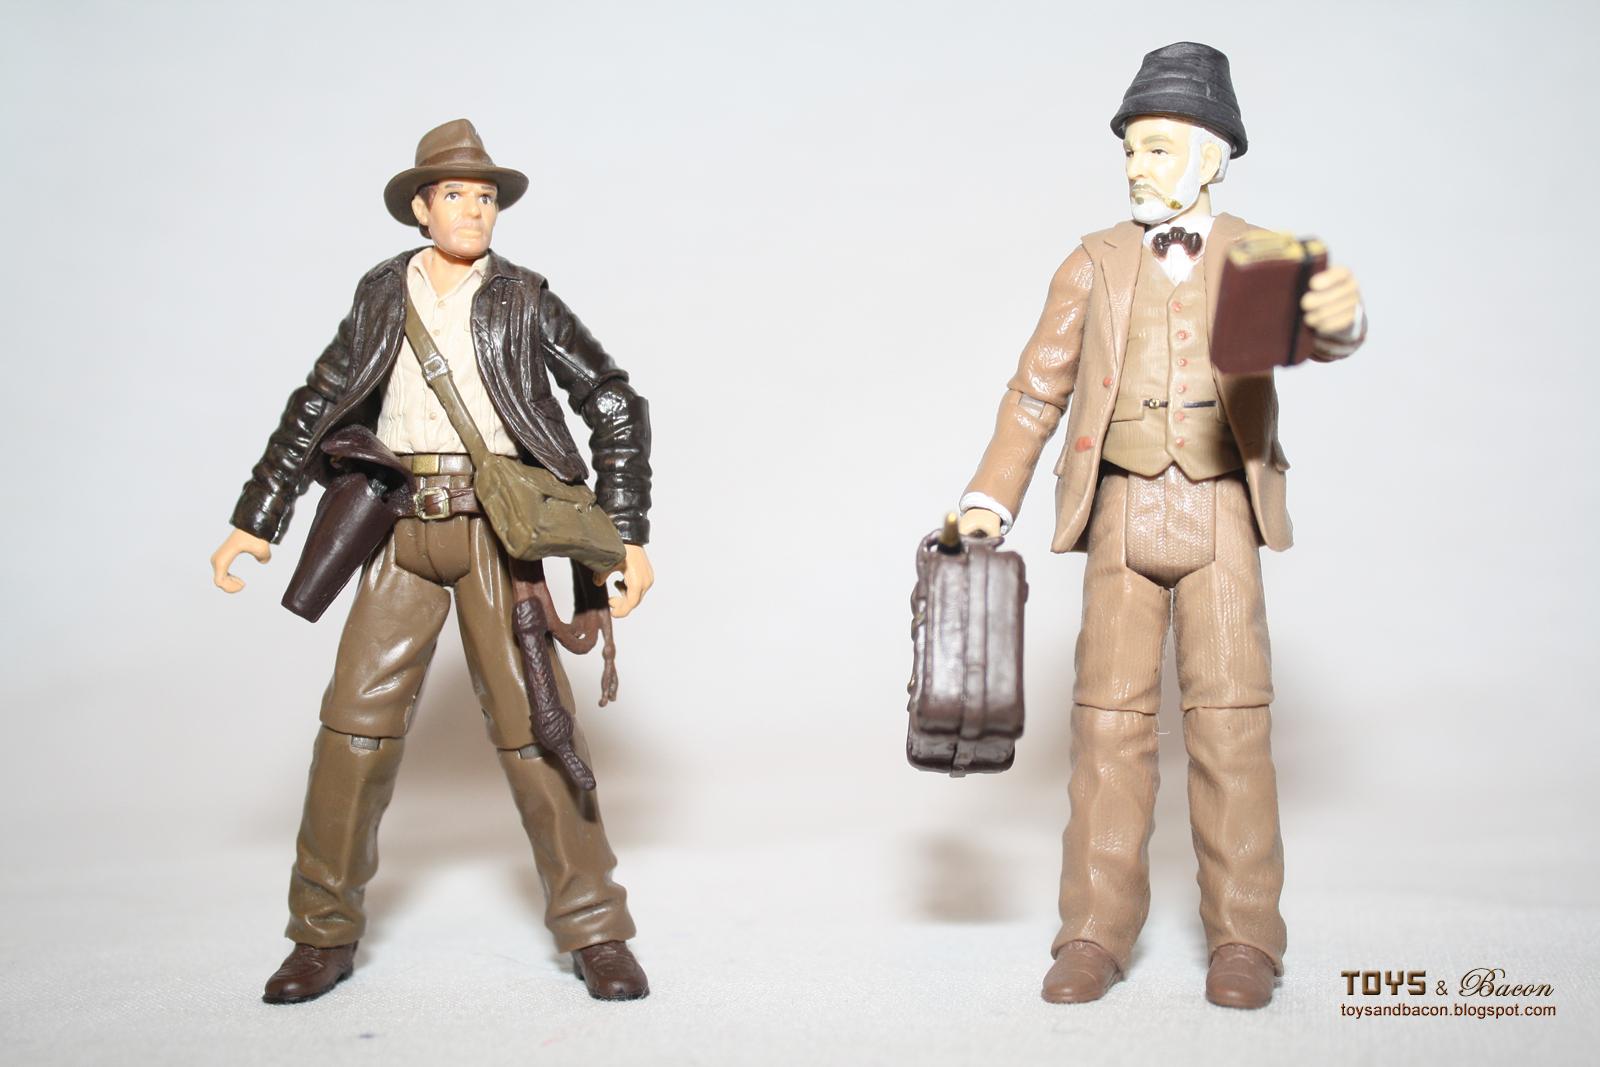 Indiana Jones Toys Cake Ideas and Designs